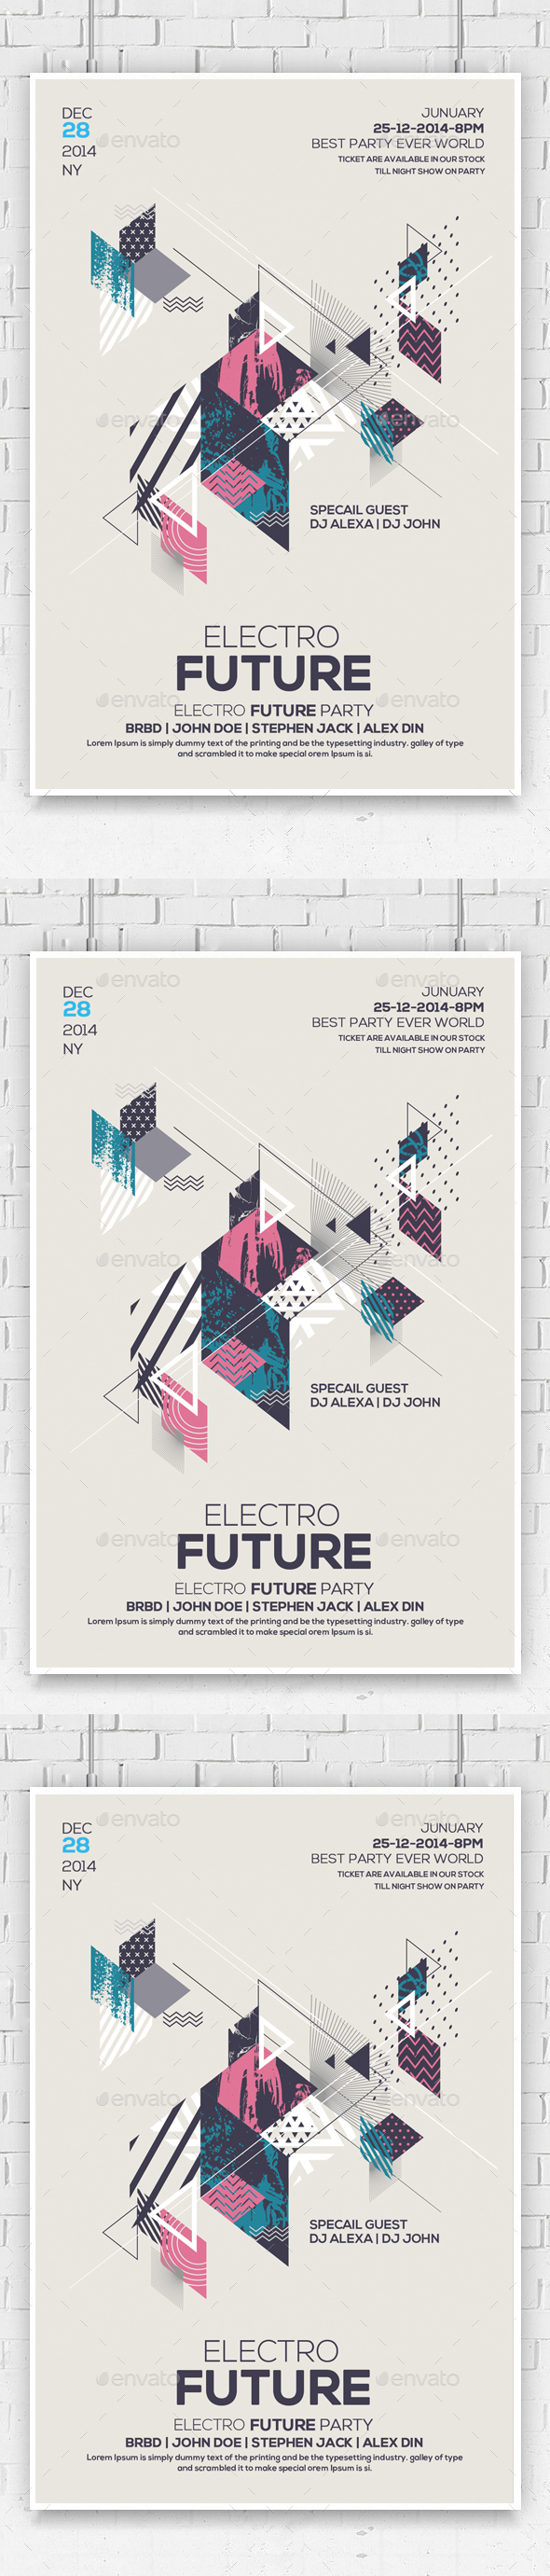 Electro Future Concert Dj Flyer - Flyers Print Templates